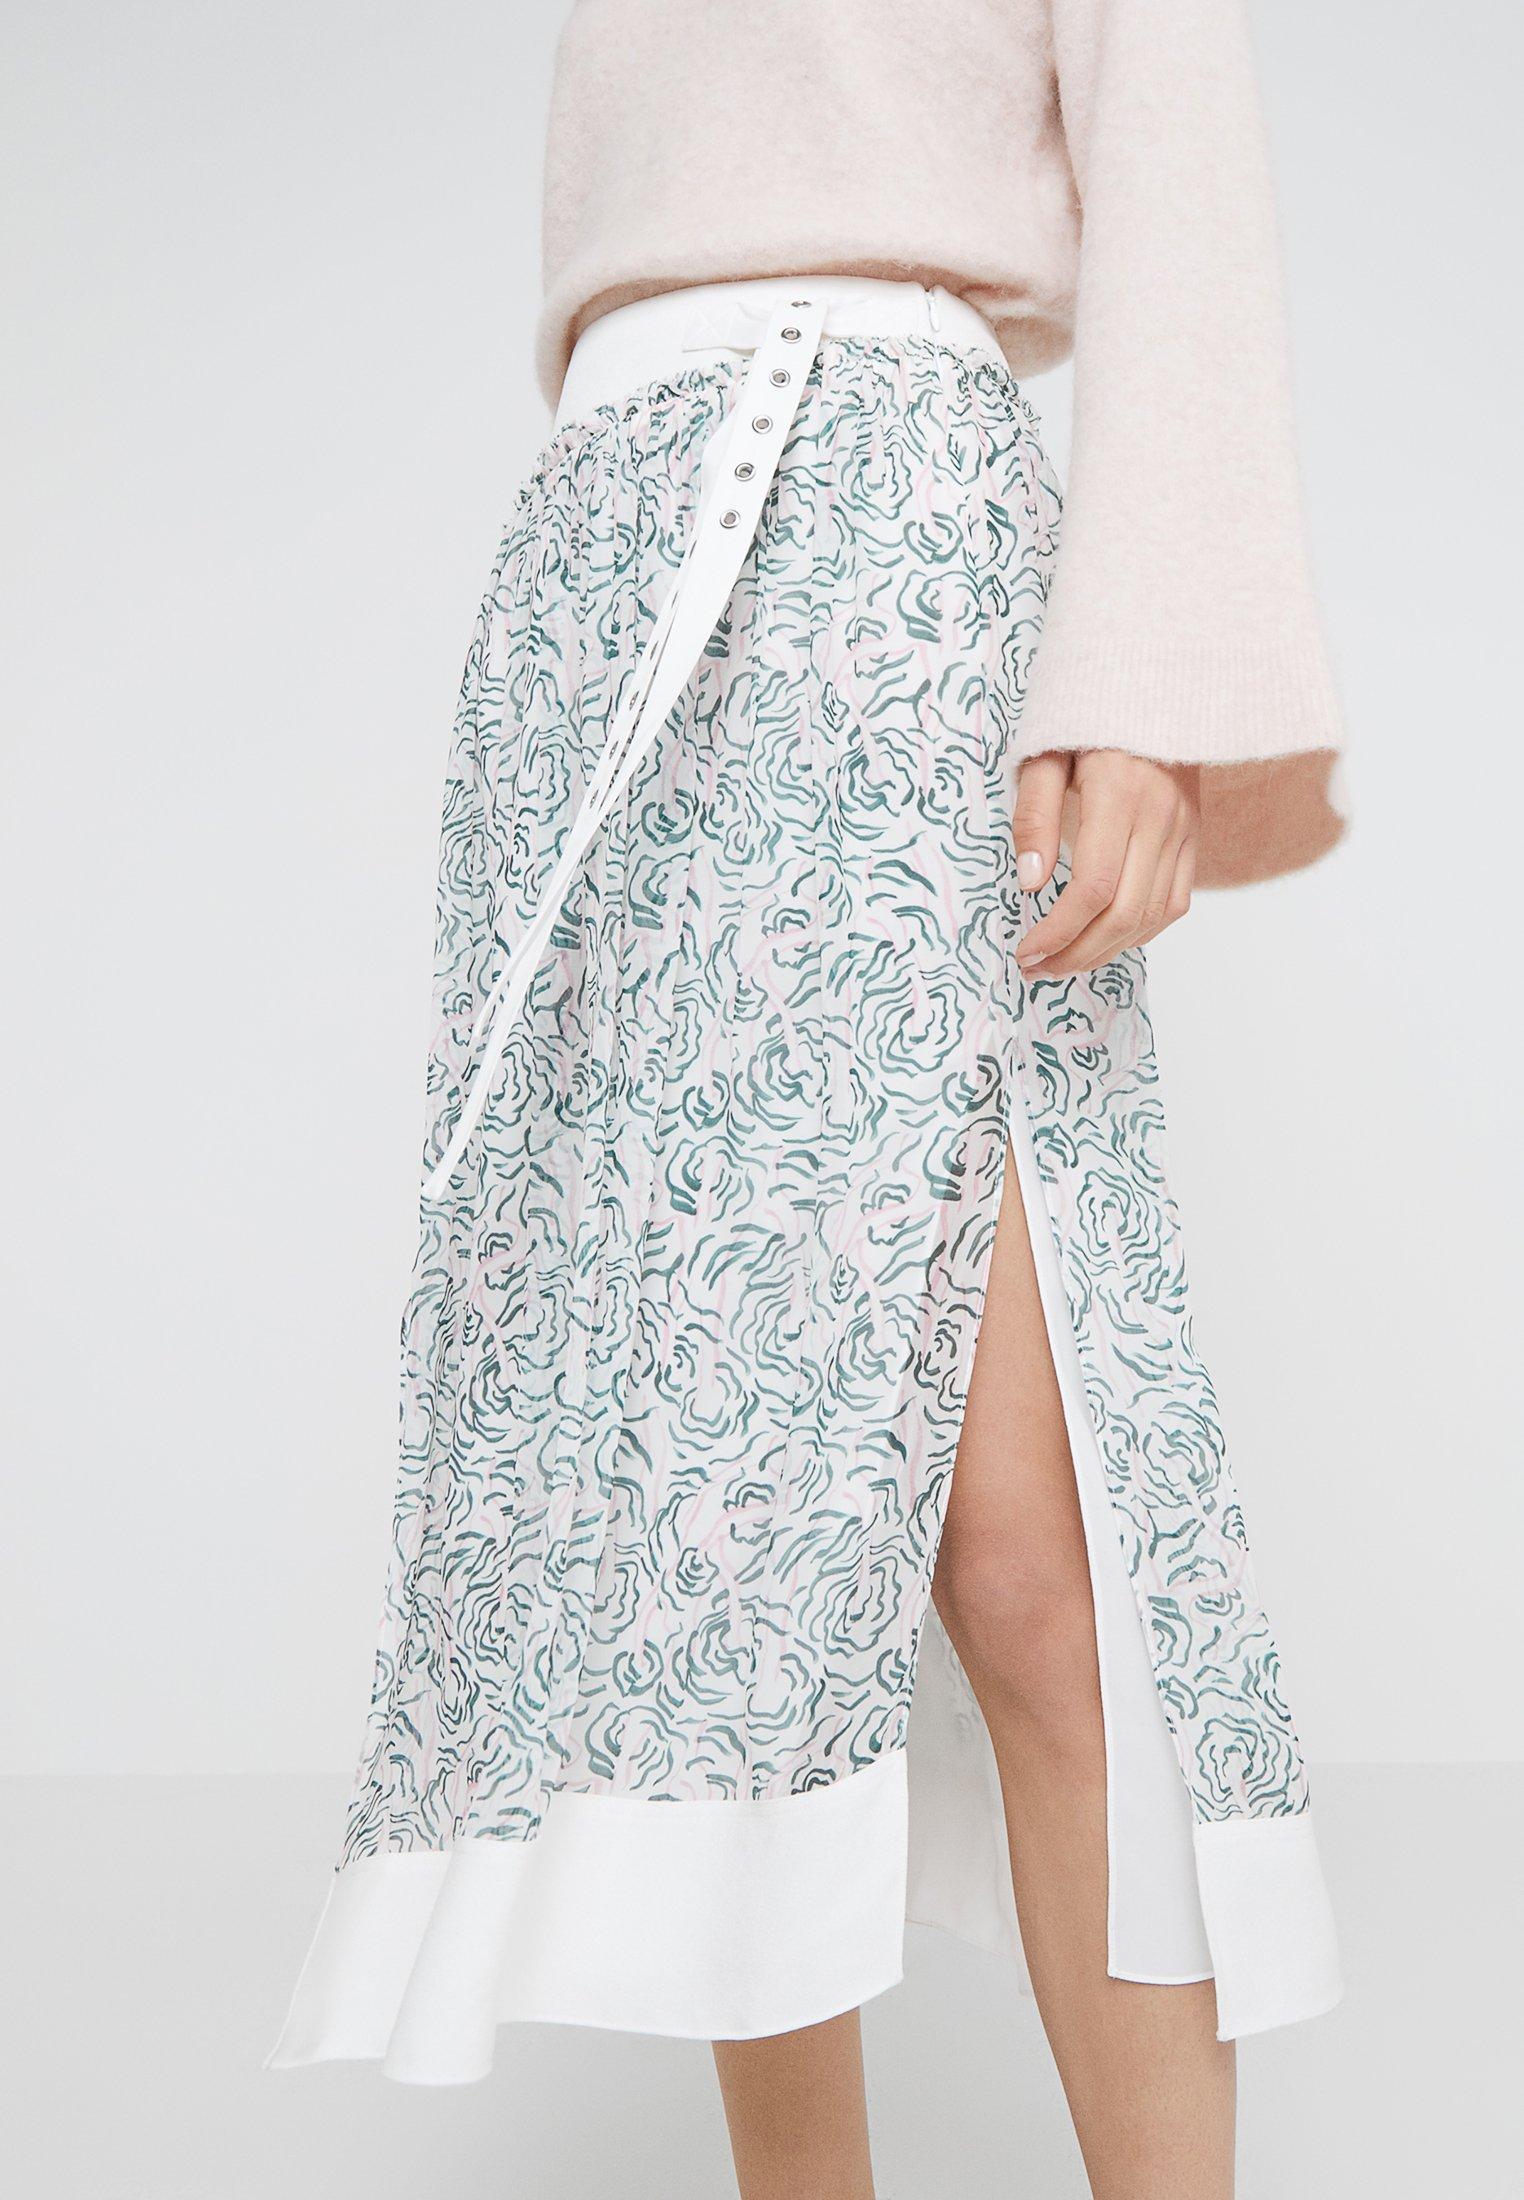 1 Phillip Trapèze Belted Shirring SkirtJupe multi 3 White Lim POuXikZ